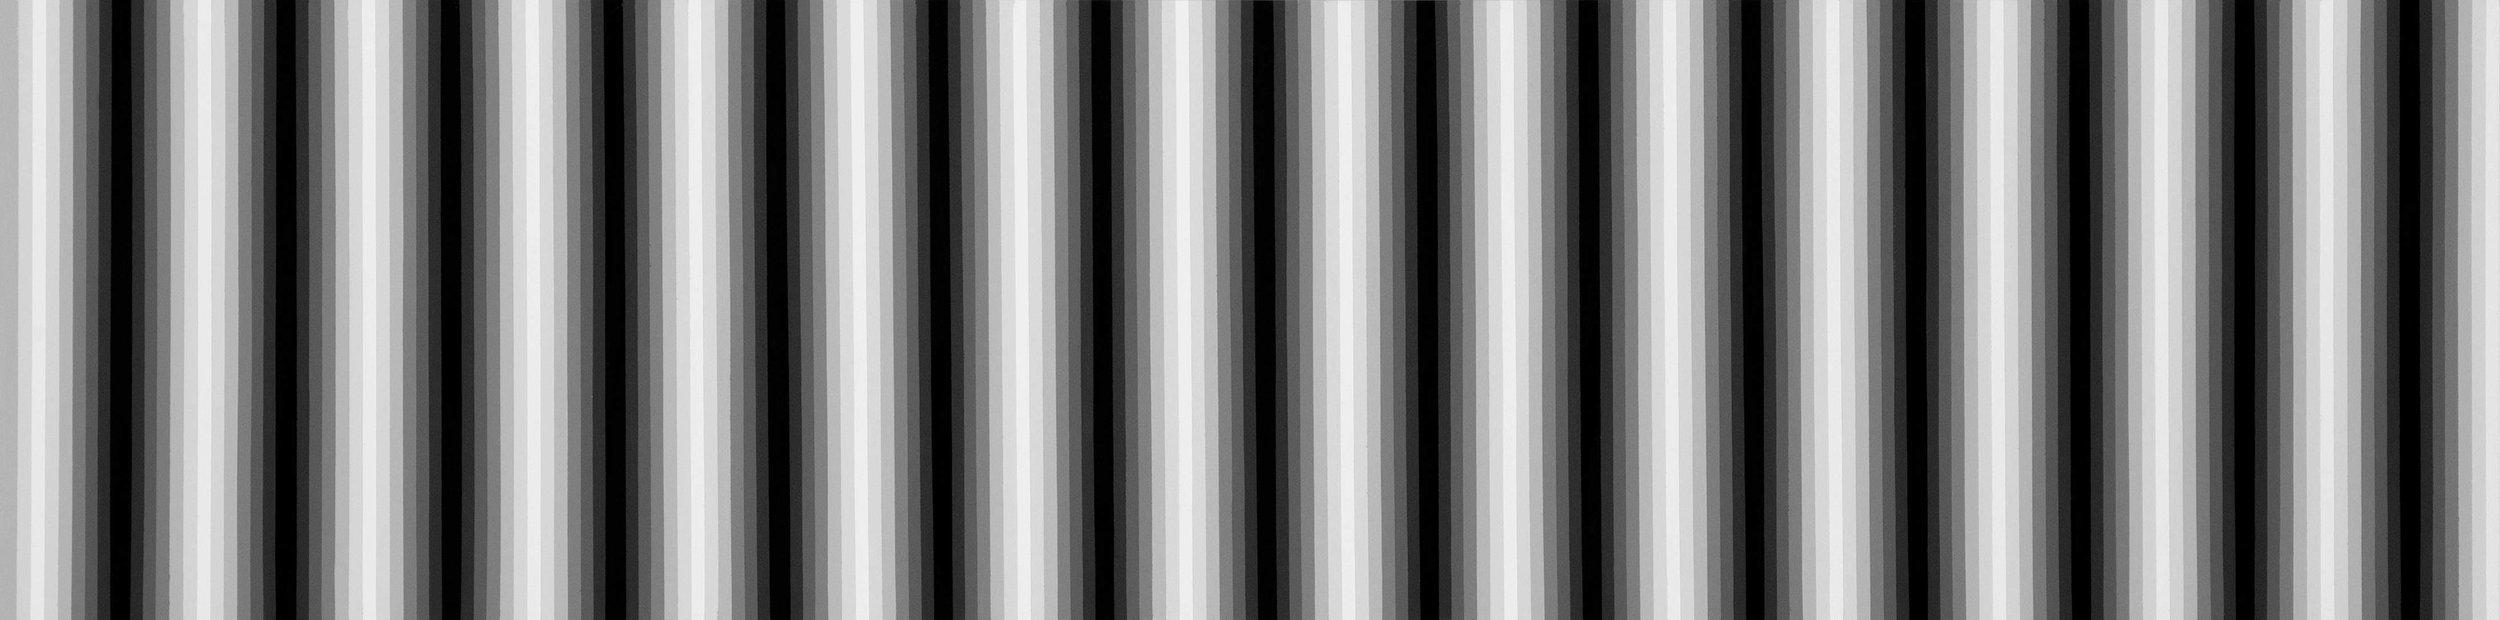 img-4606.jpg